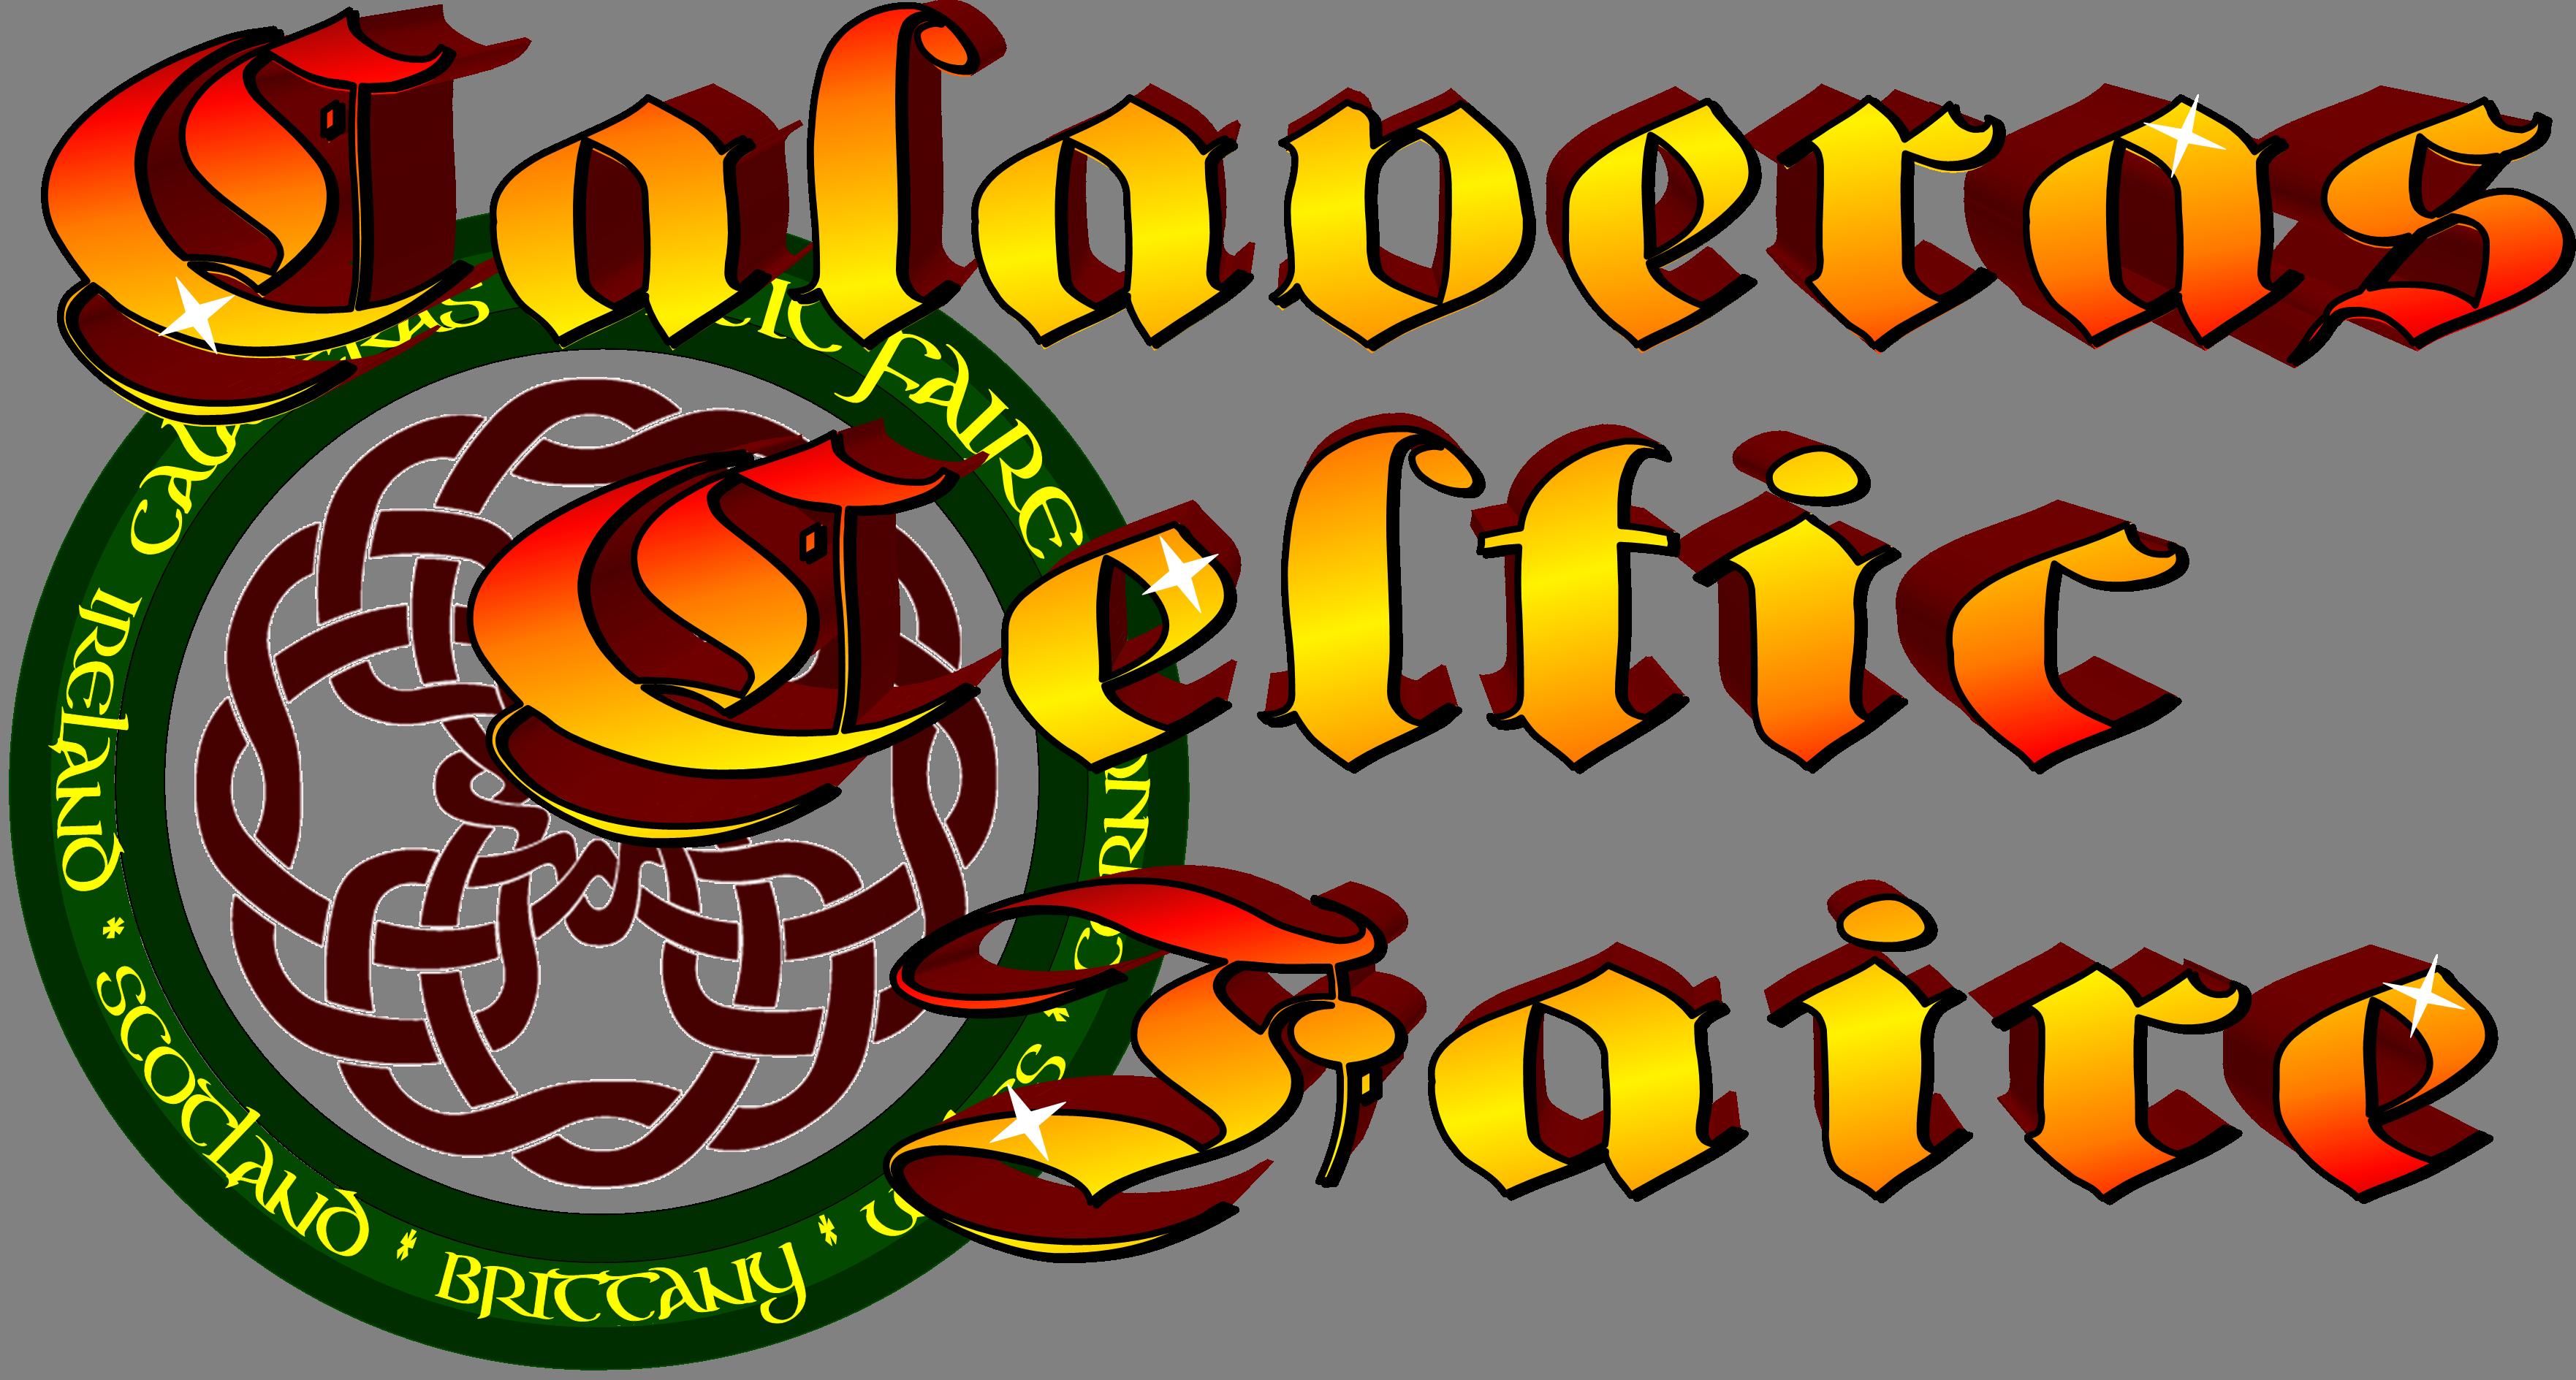 Calaveras Celtic Faire